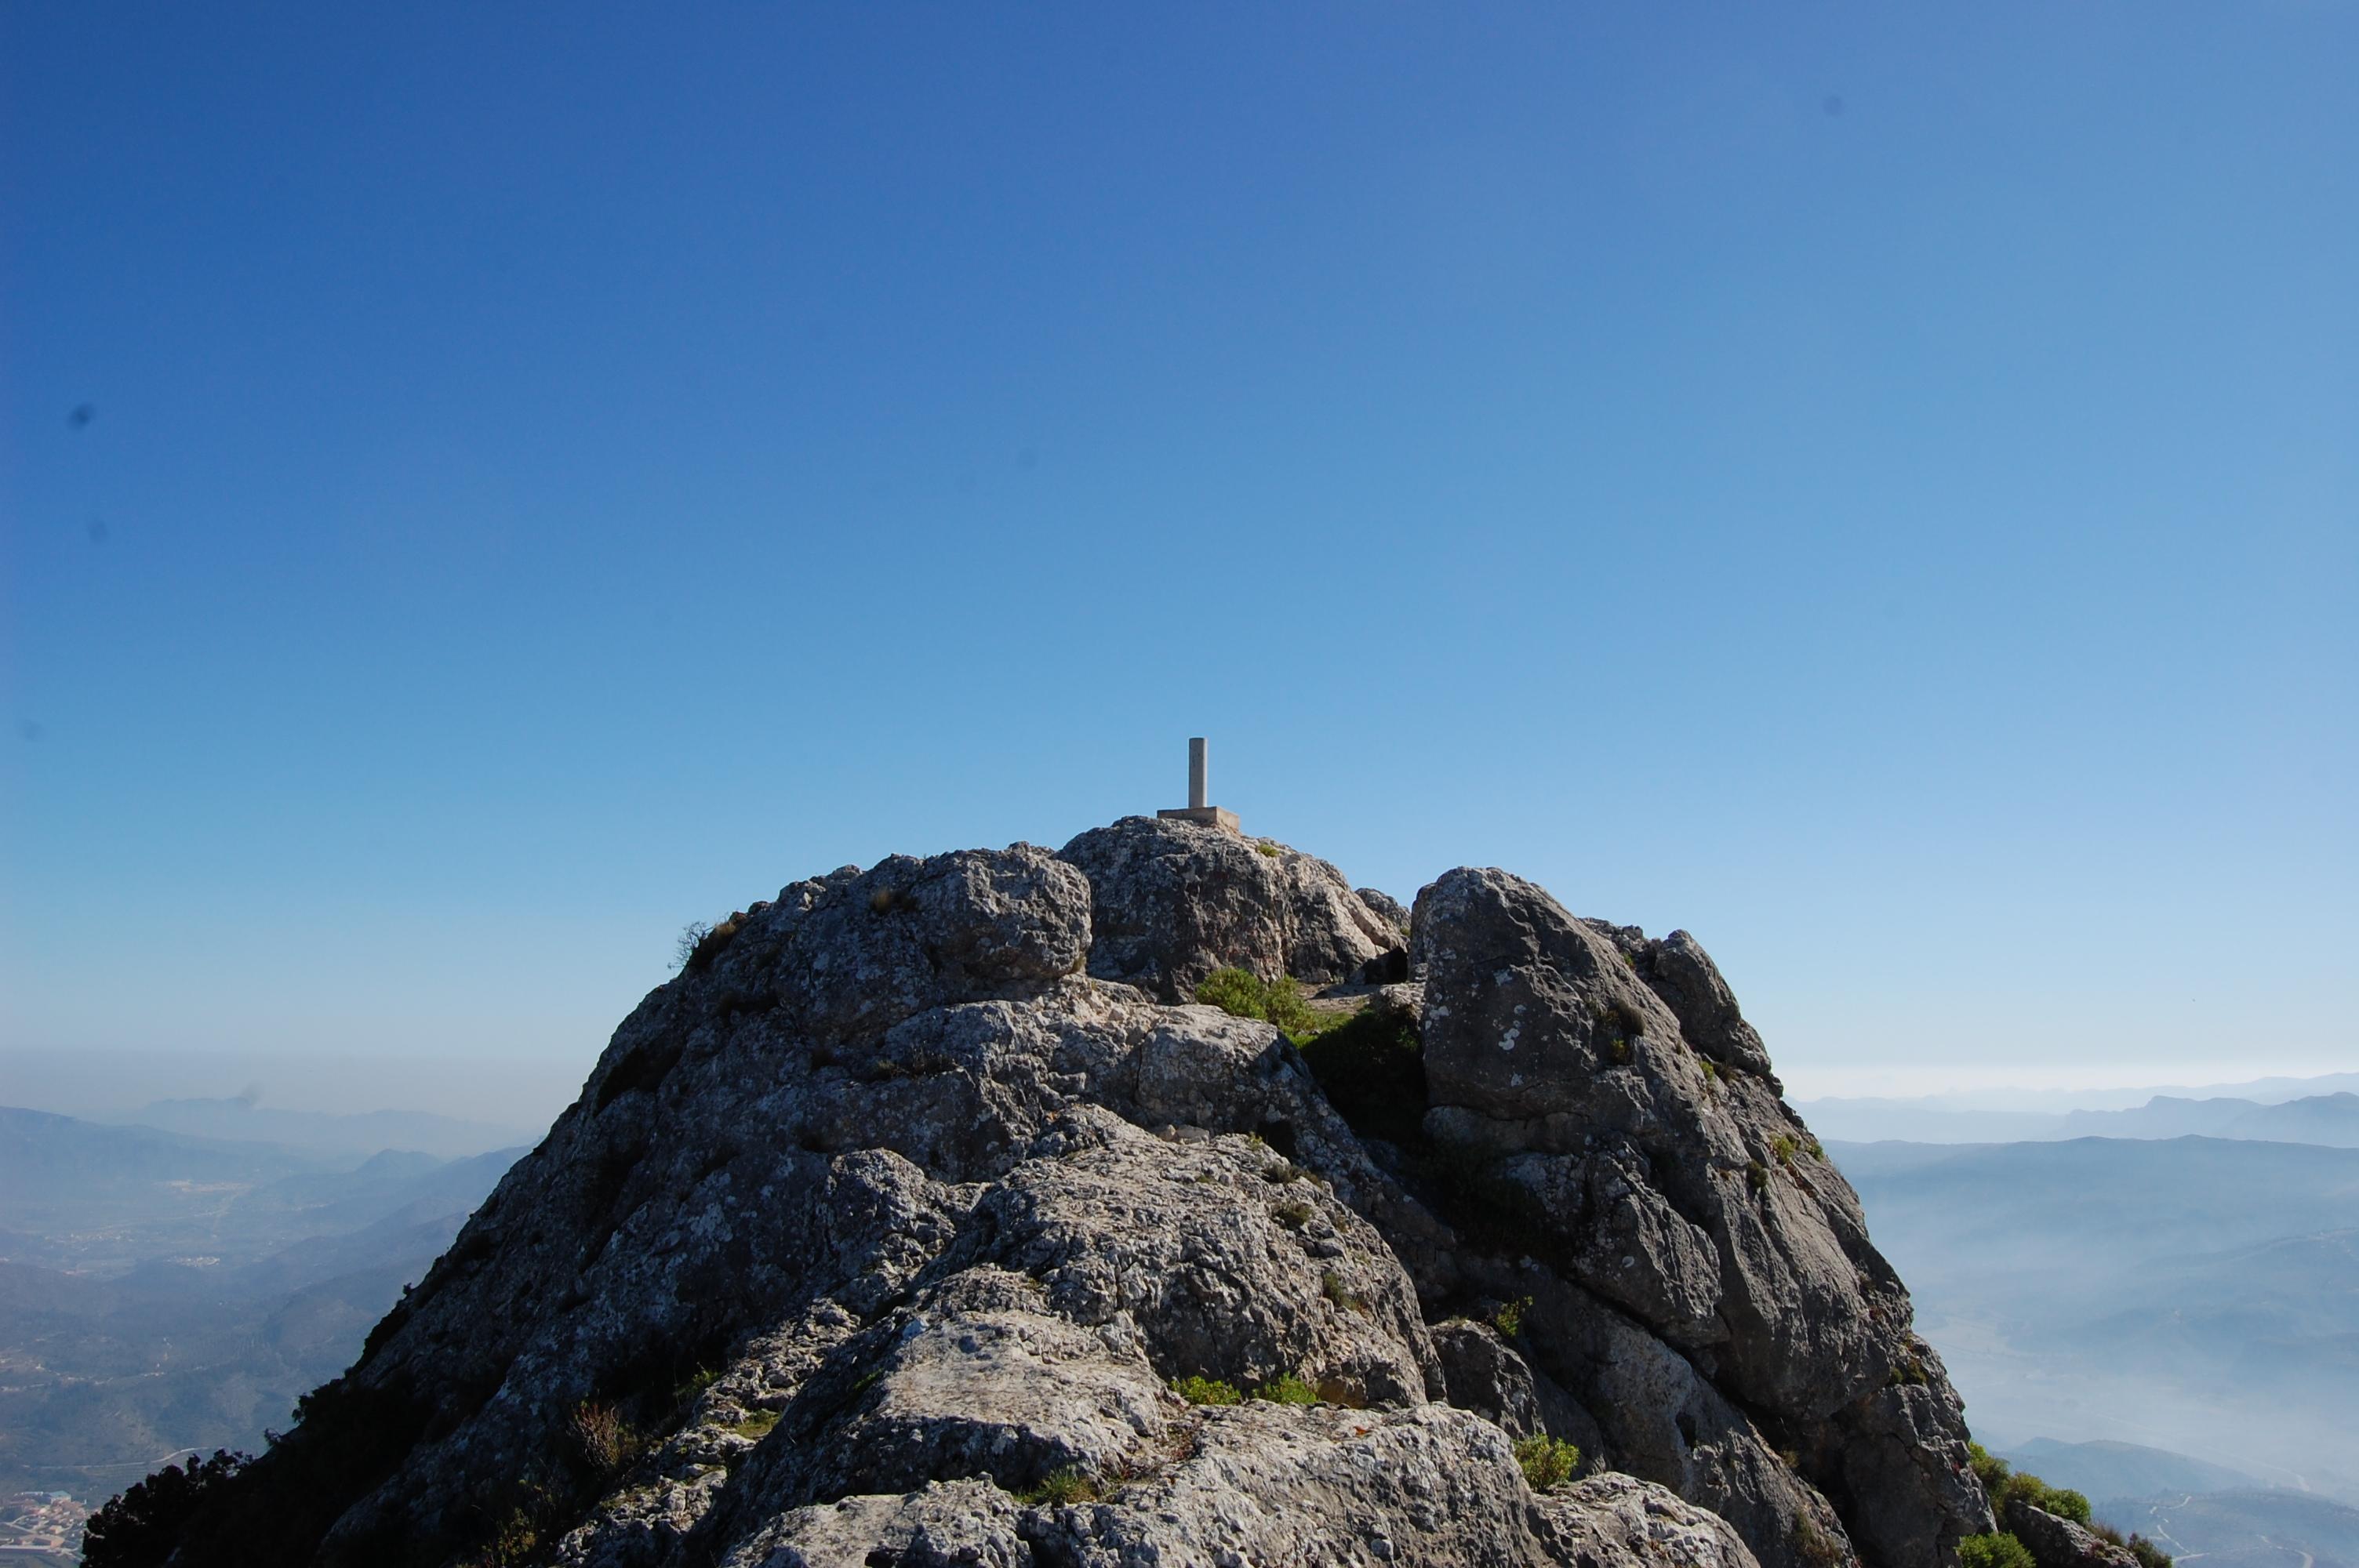 Benicadell 1105 msnm